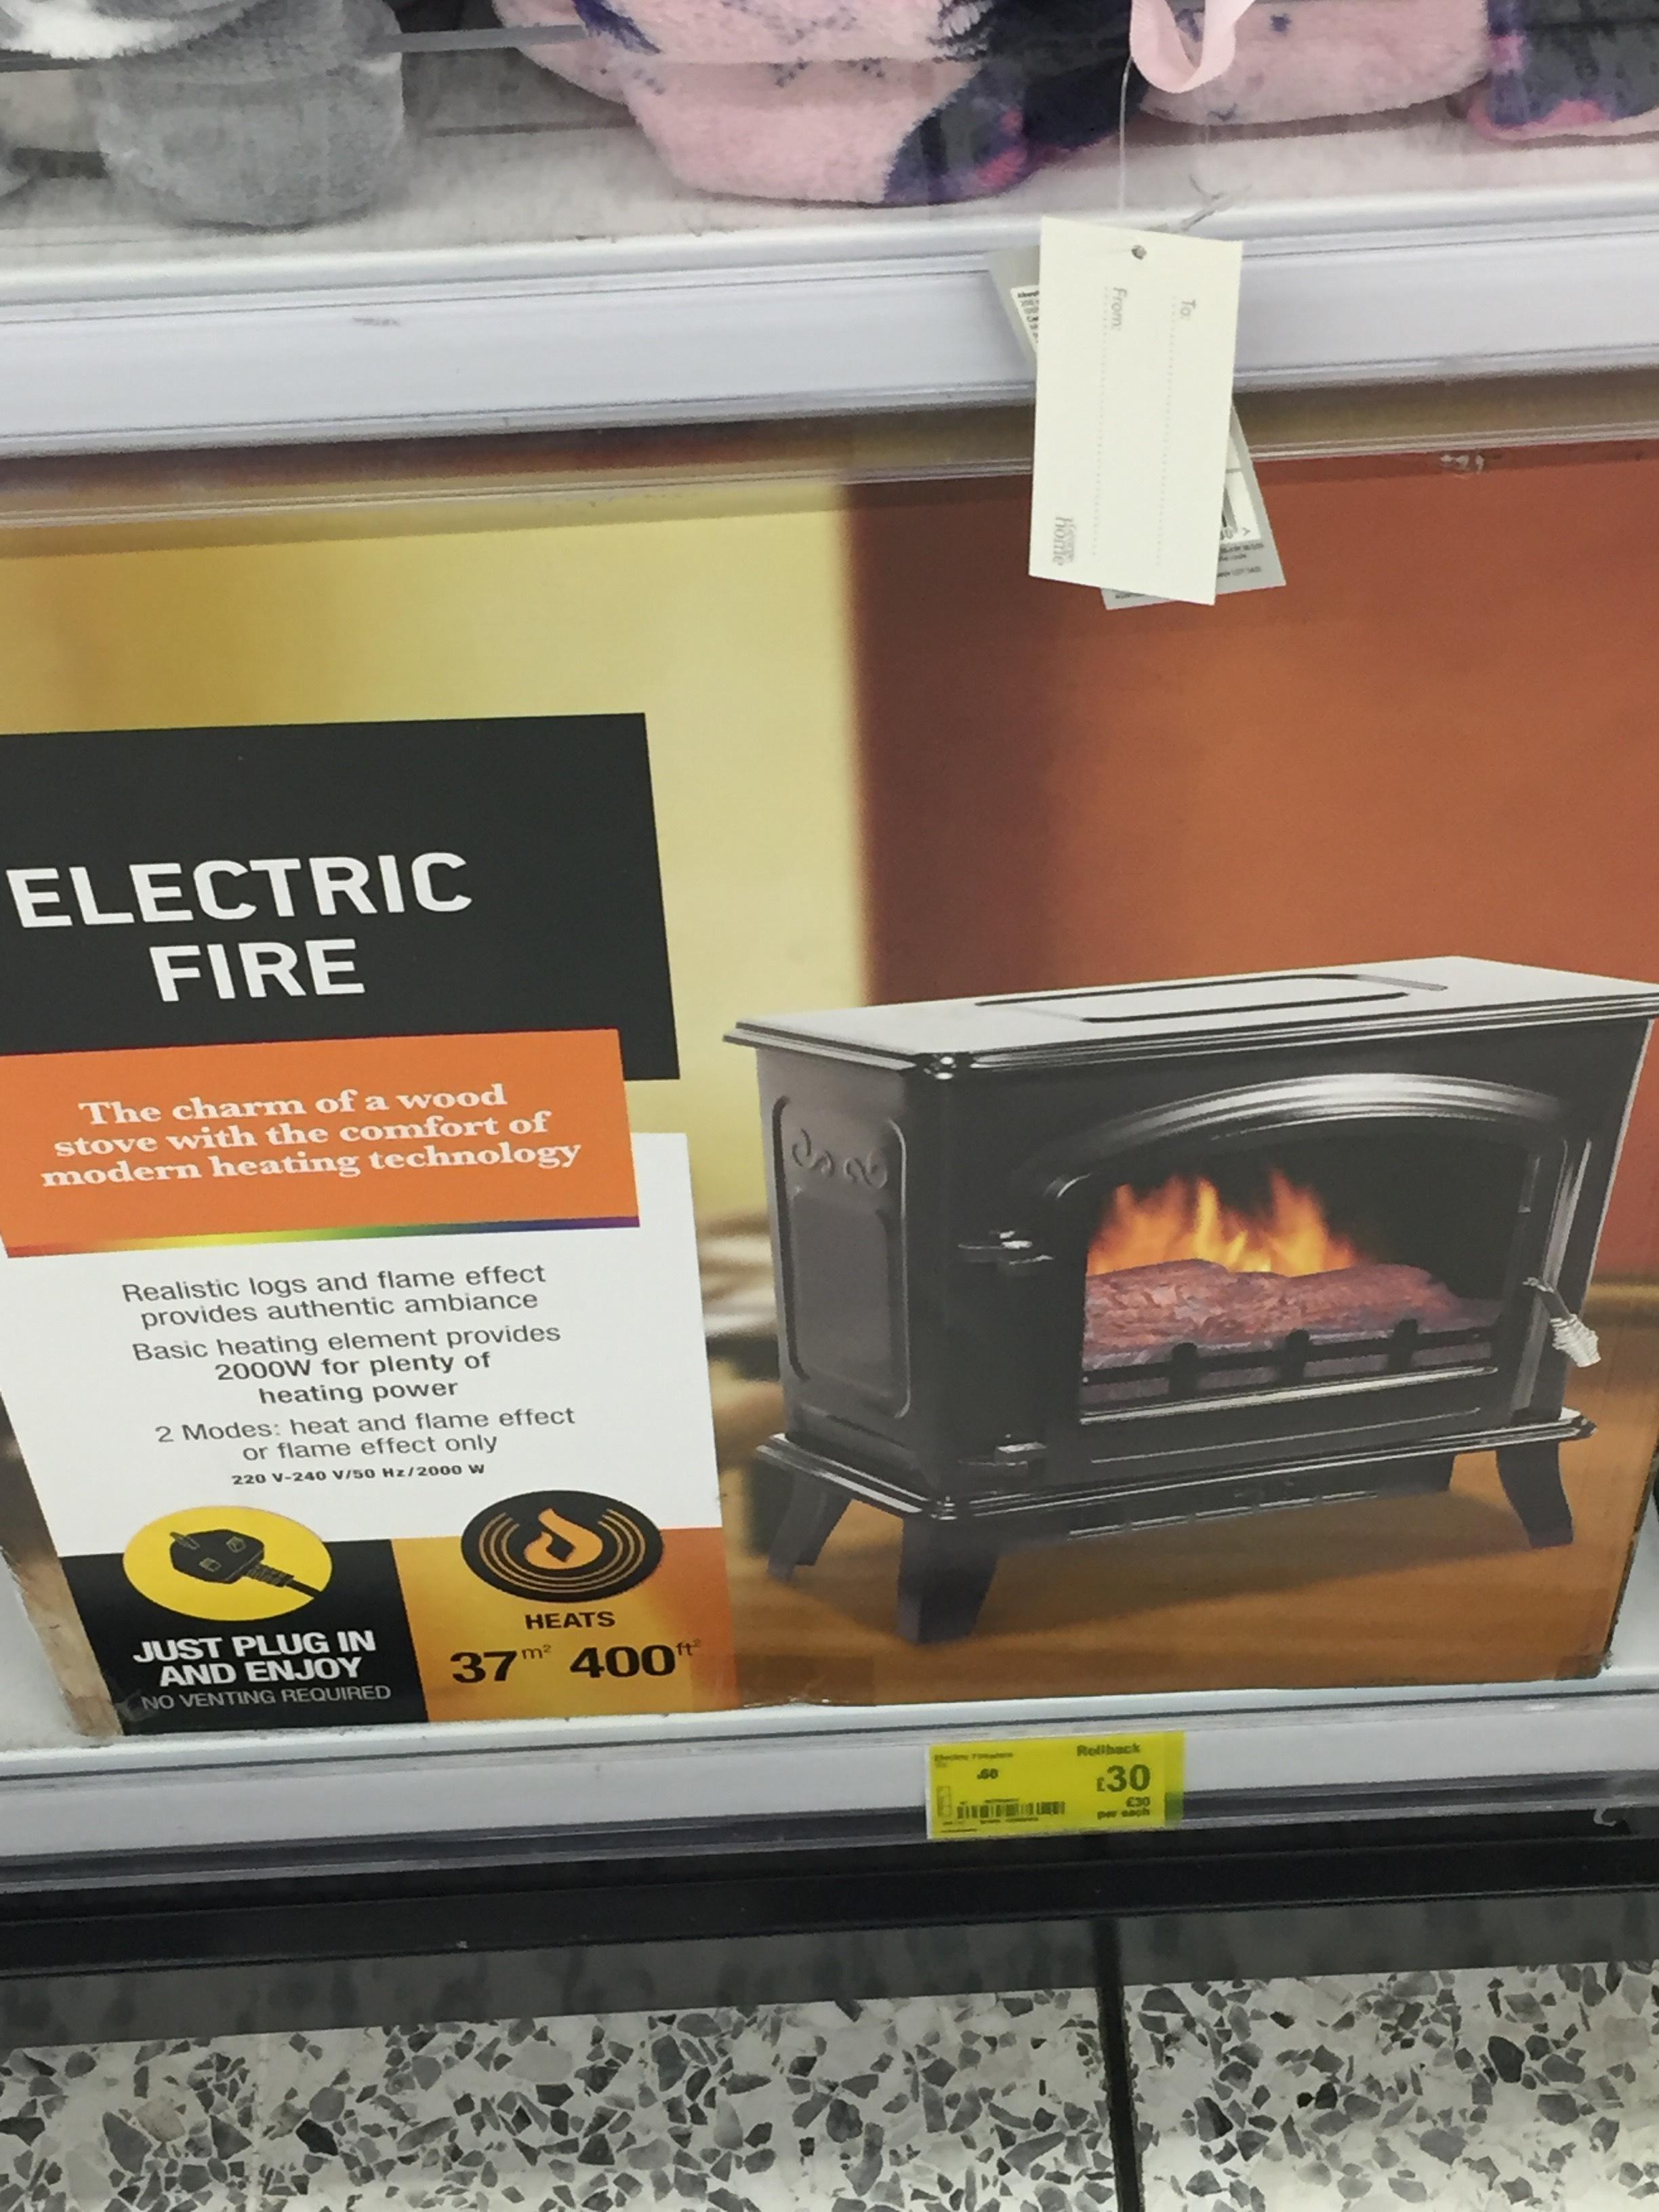 Electric Fire Half price - £30 instore @ ASDA Newport